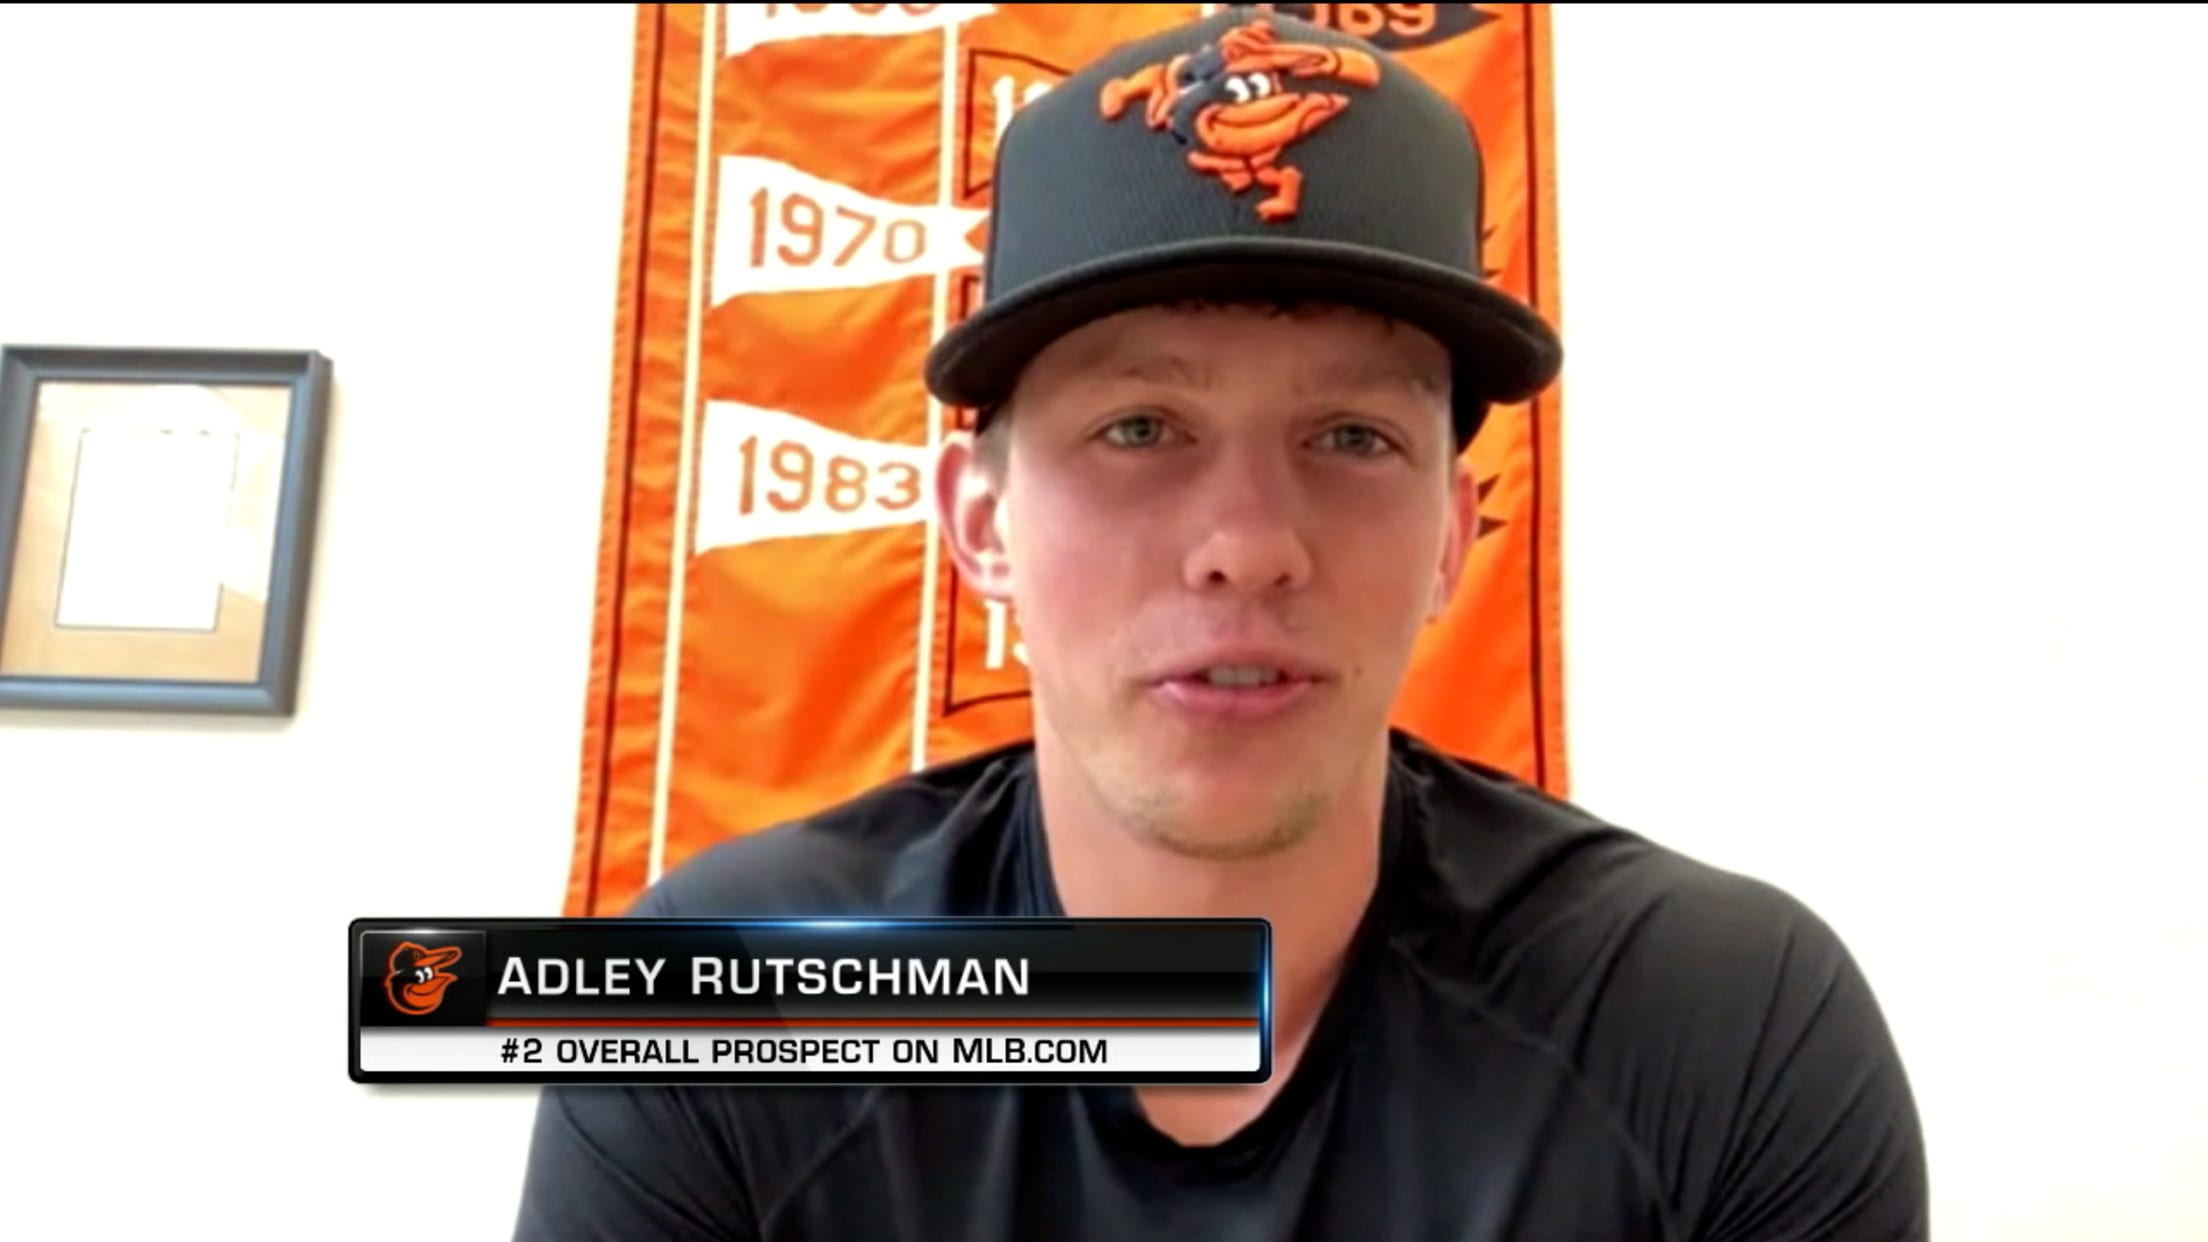 Adley Rutschman on ST thus far